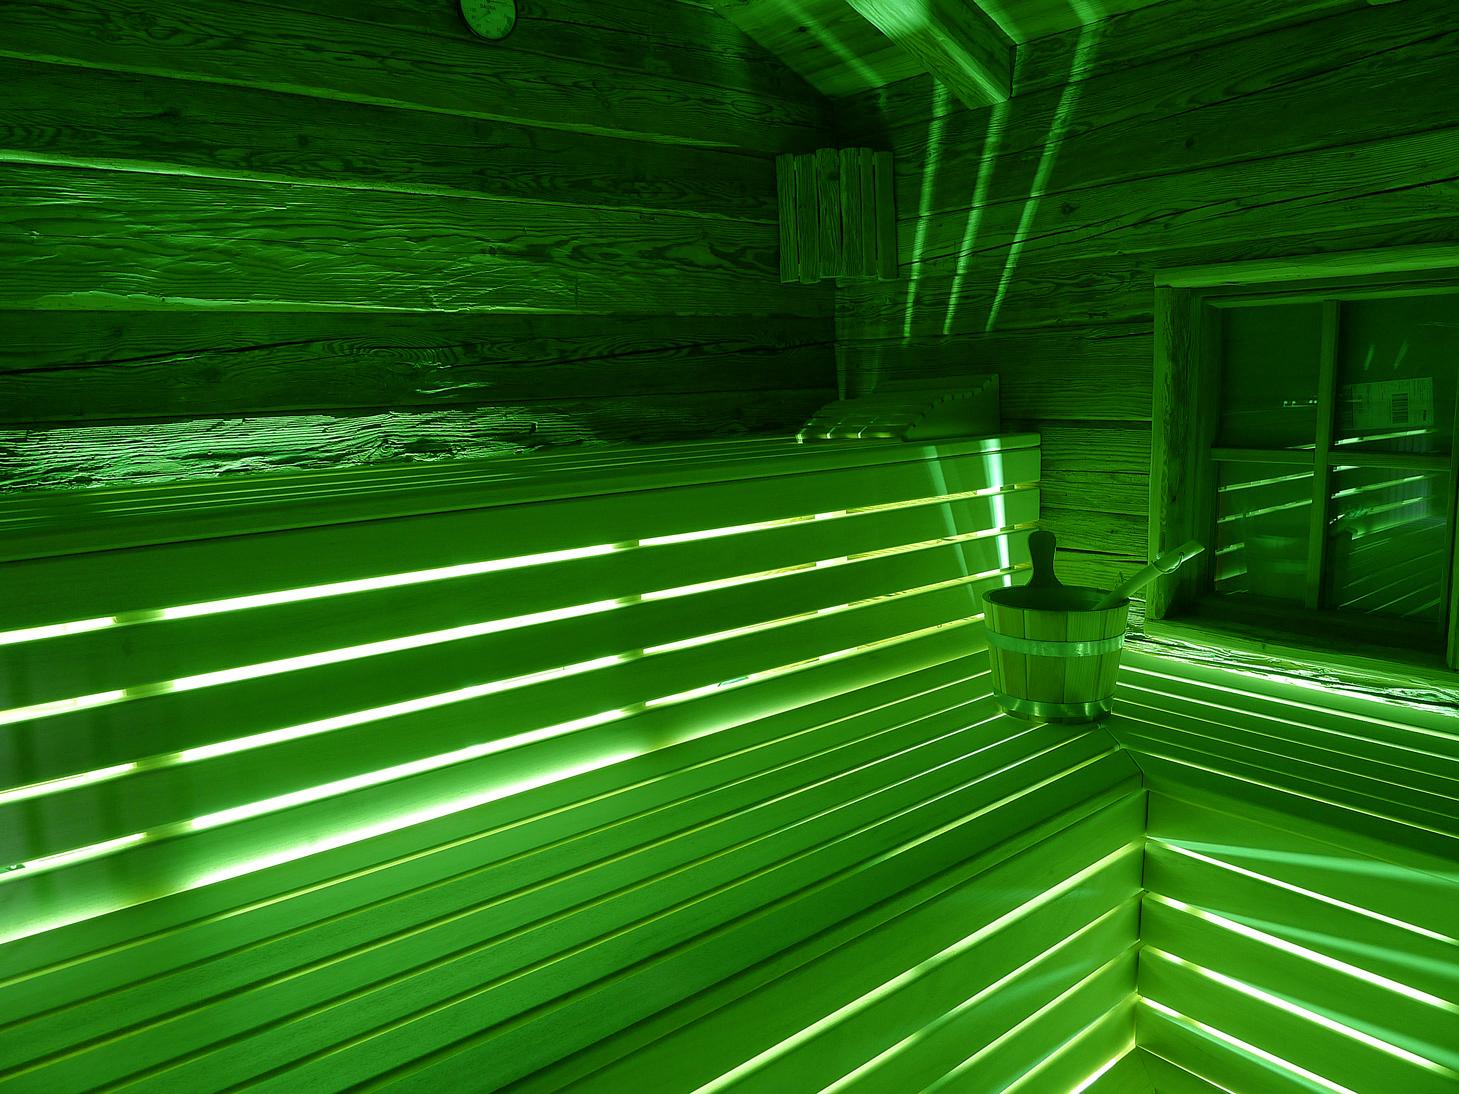 sauna beleuchtung paulus exklusiver saunabau in rustikaler bergh tten optik blockhaus sauna. Black Bedroom Furniture Sets. Home Design Ideas